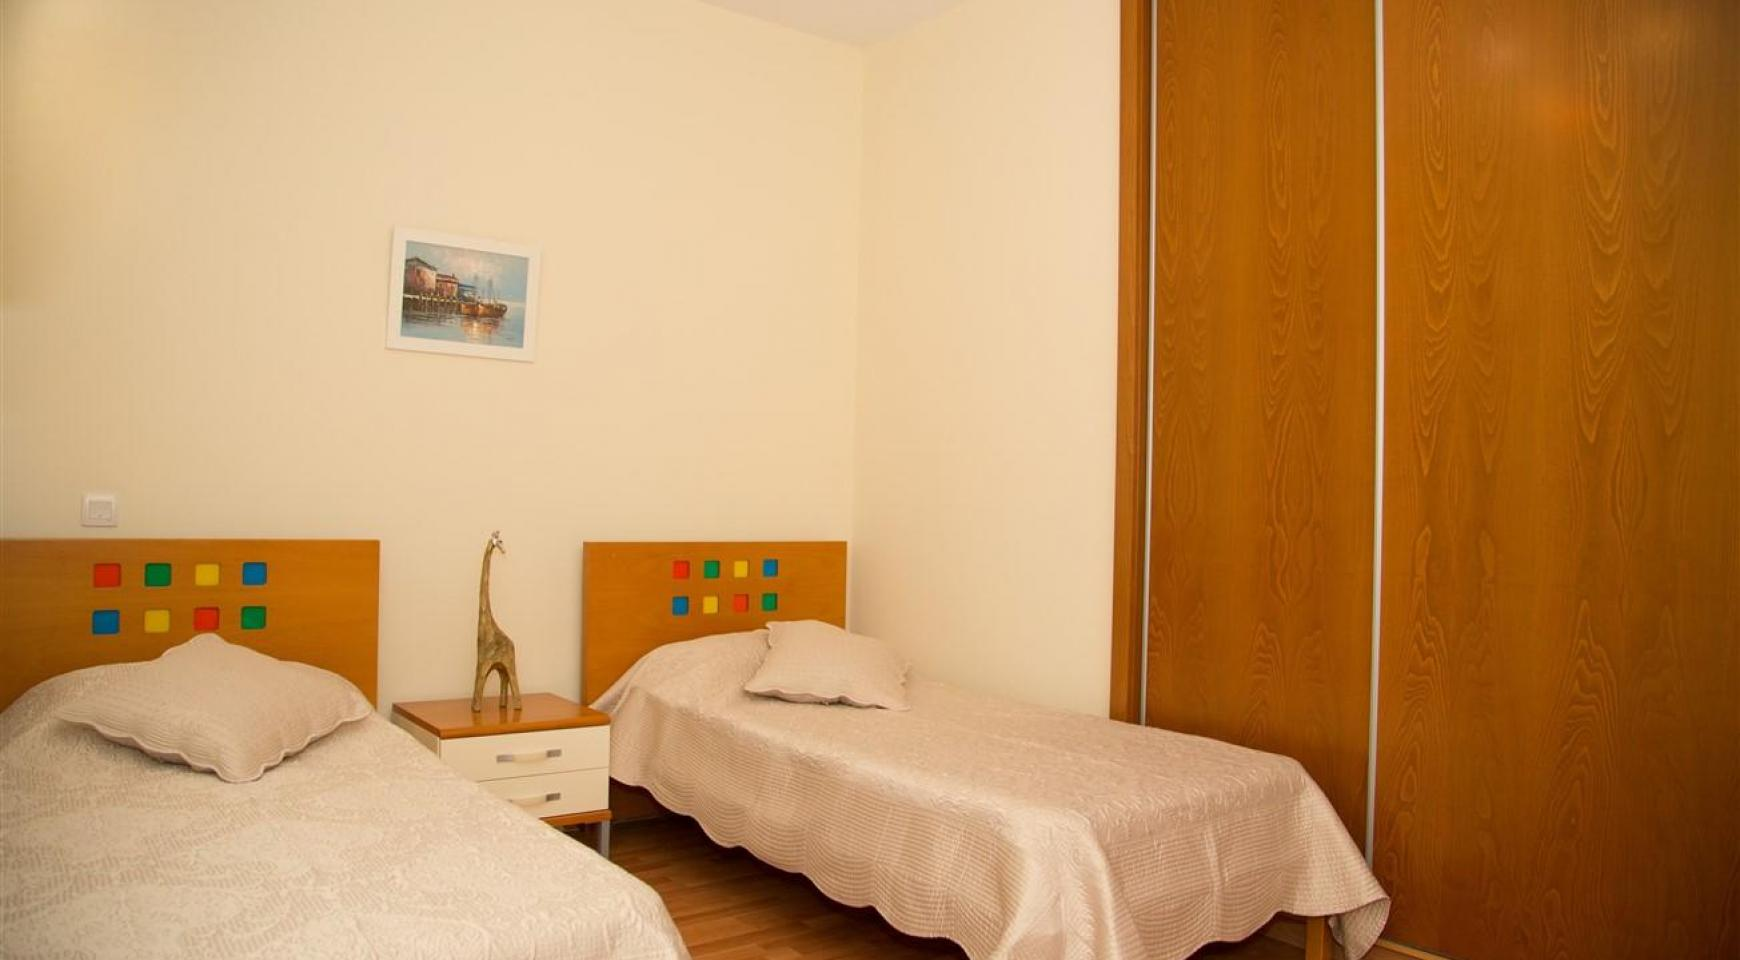 3-Спальная Квартира на Берегу Моря в Комплексе Thera   - 17